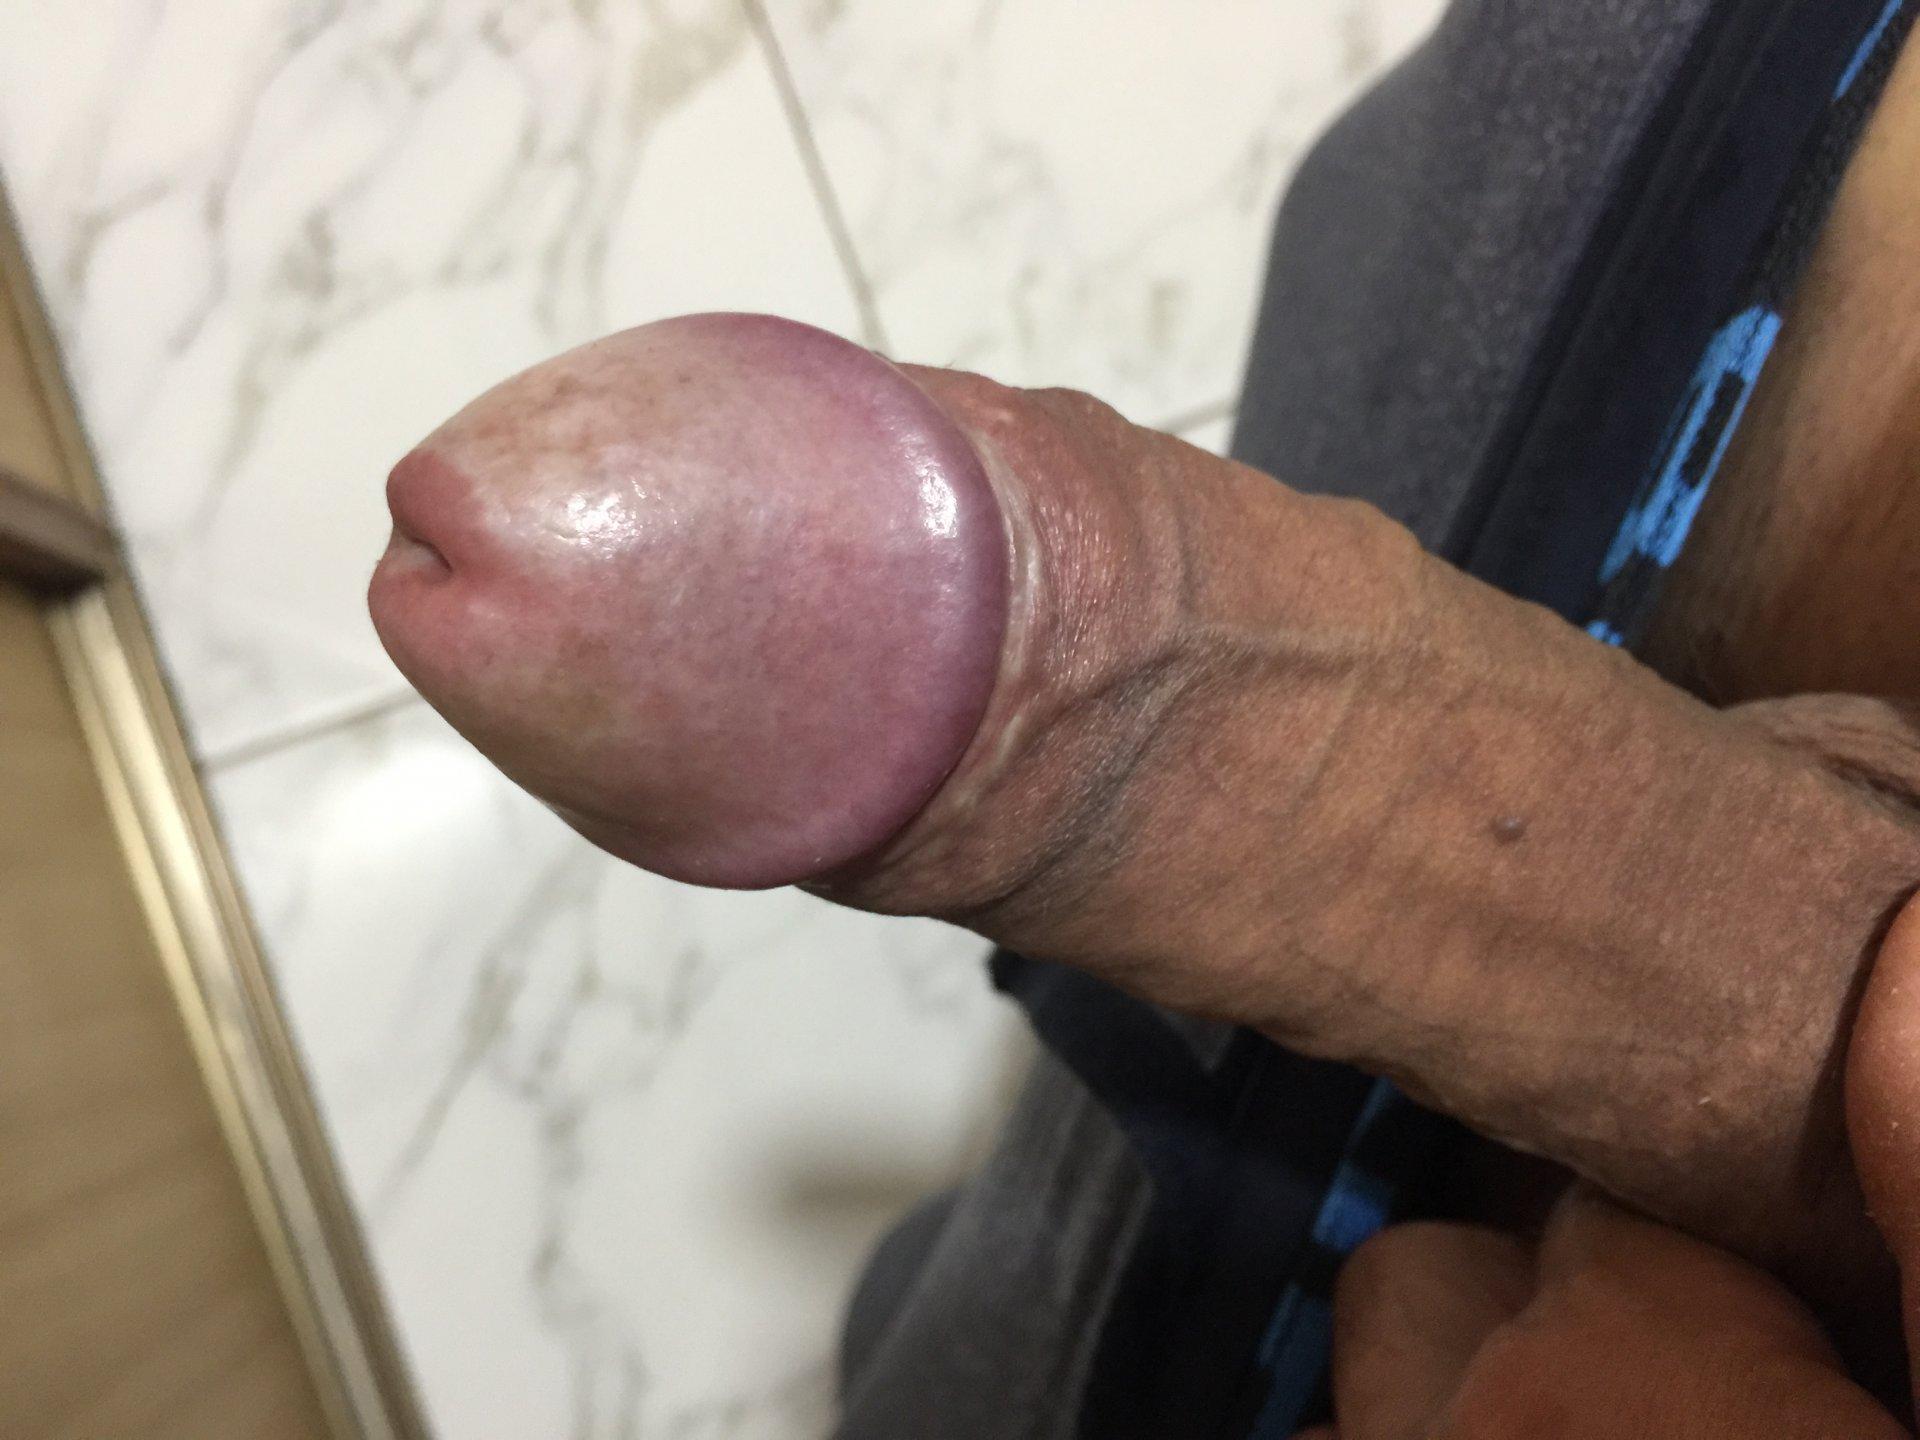 James74 from South Australia,Australia